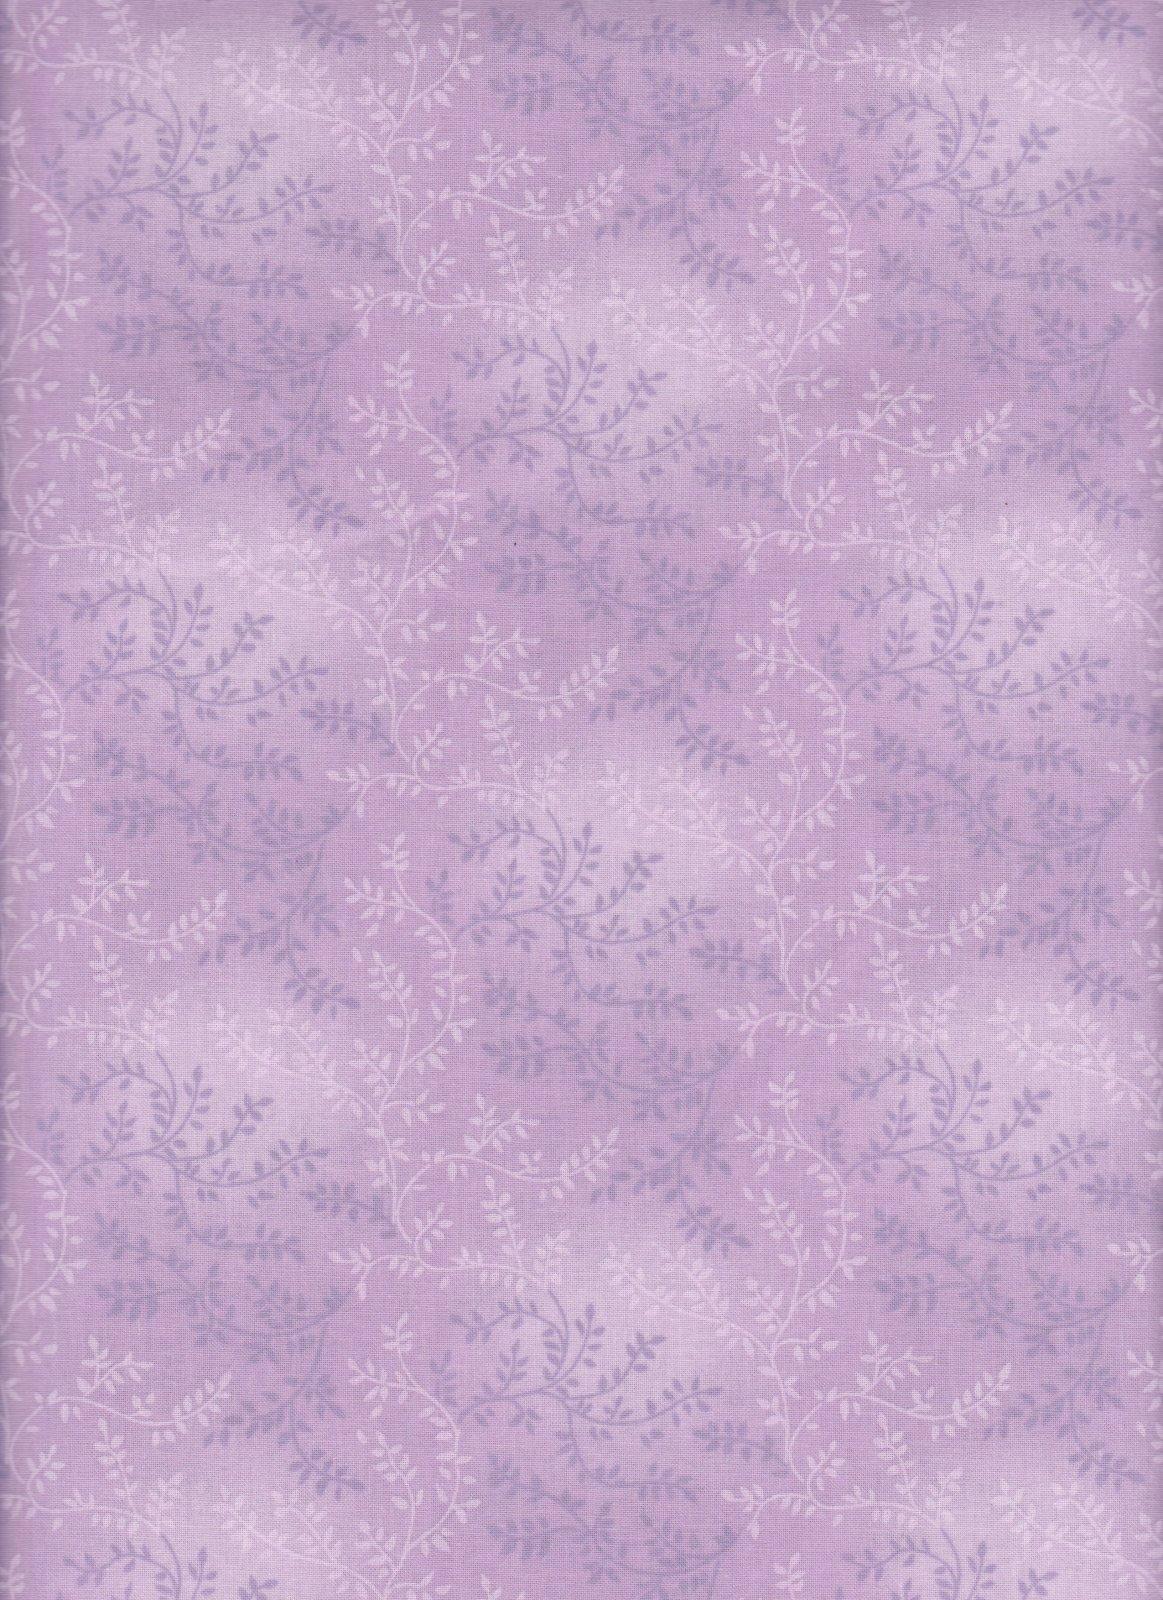 Tonal Vineyard 108 Backing (Lilac)